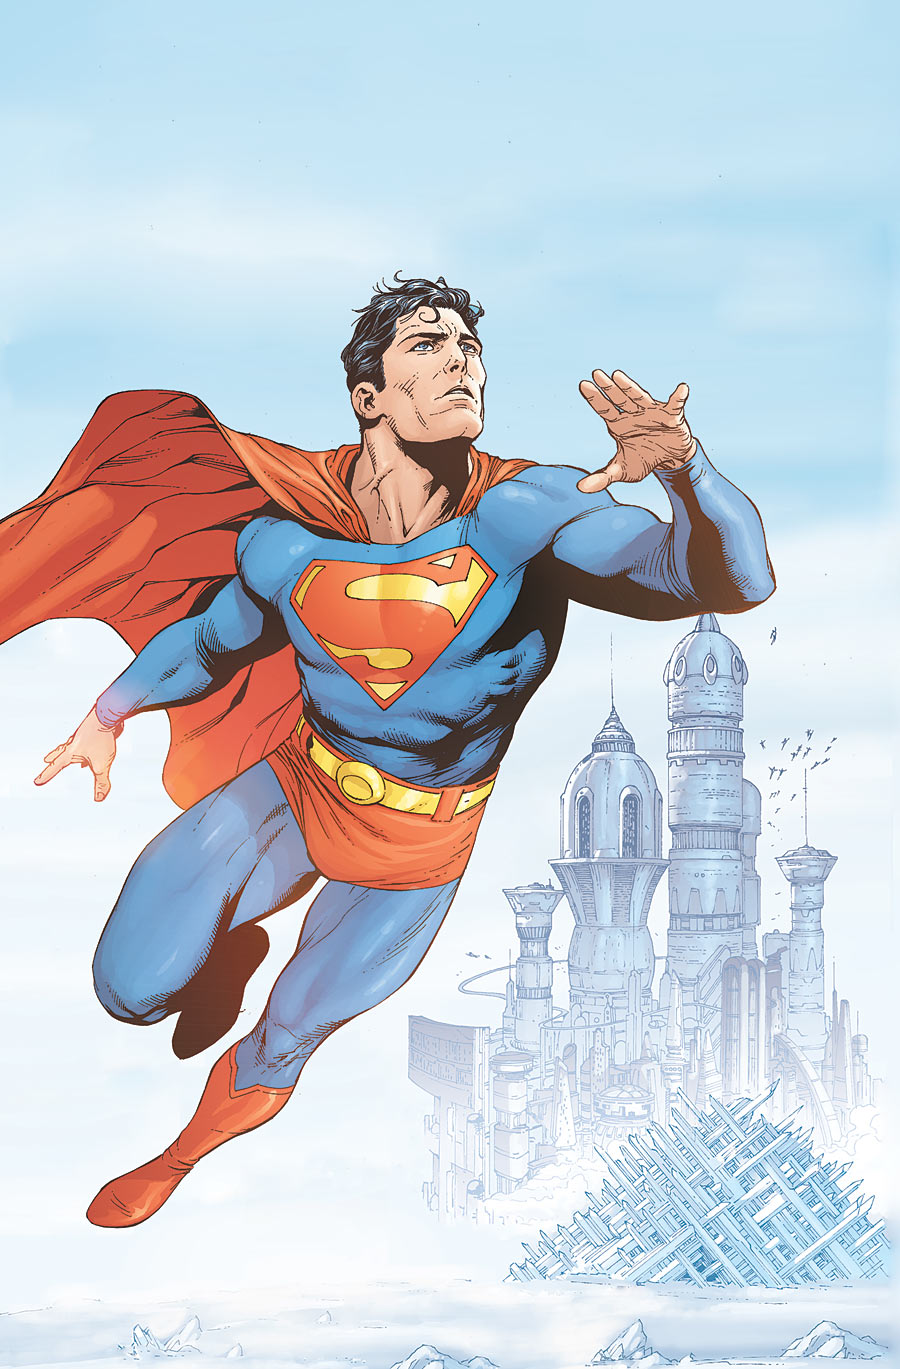 images2.wikia.nocookie.net/__cb20100420173221/marvel_dc/images/1/1e/Superman_0020.jpg